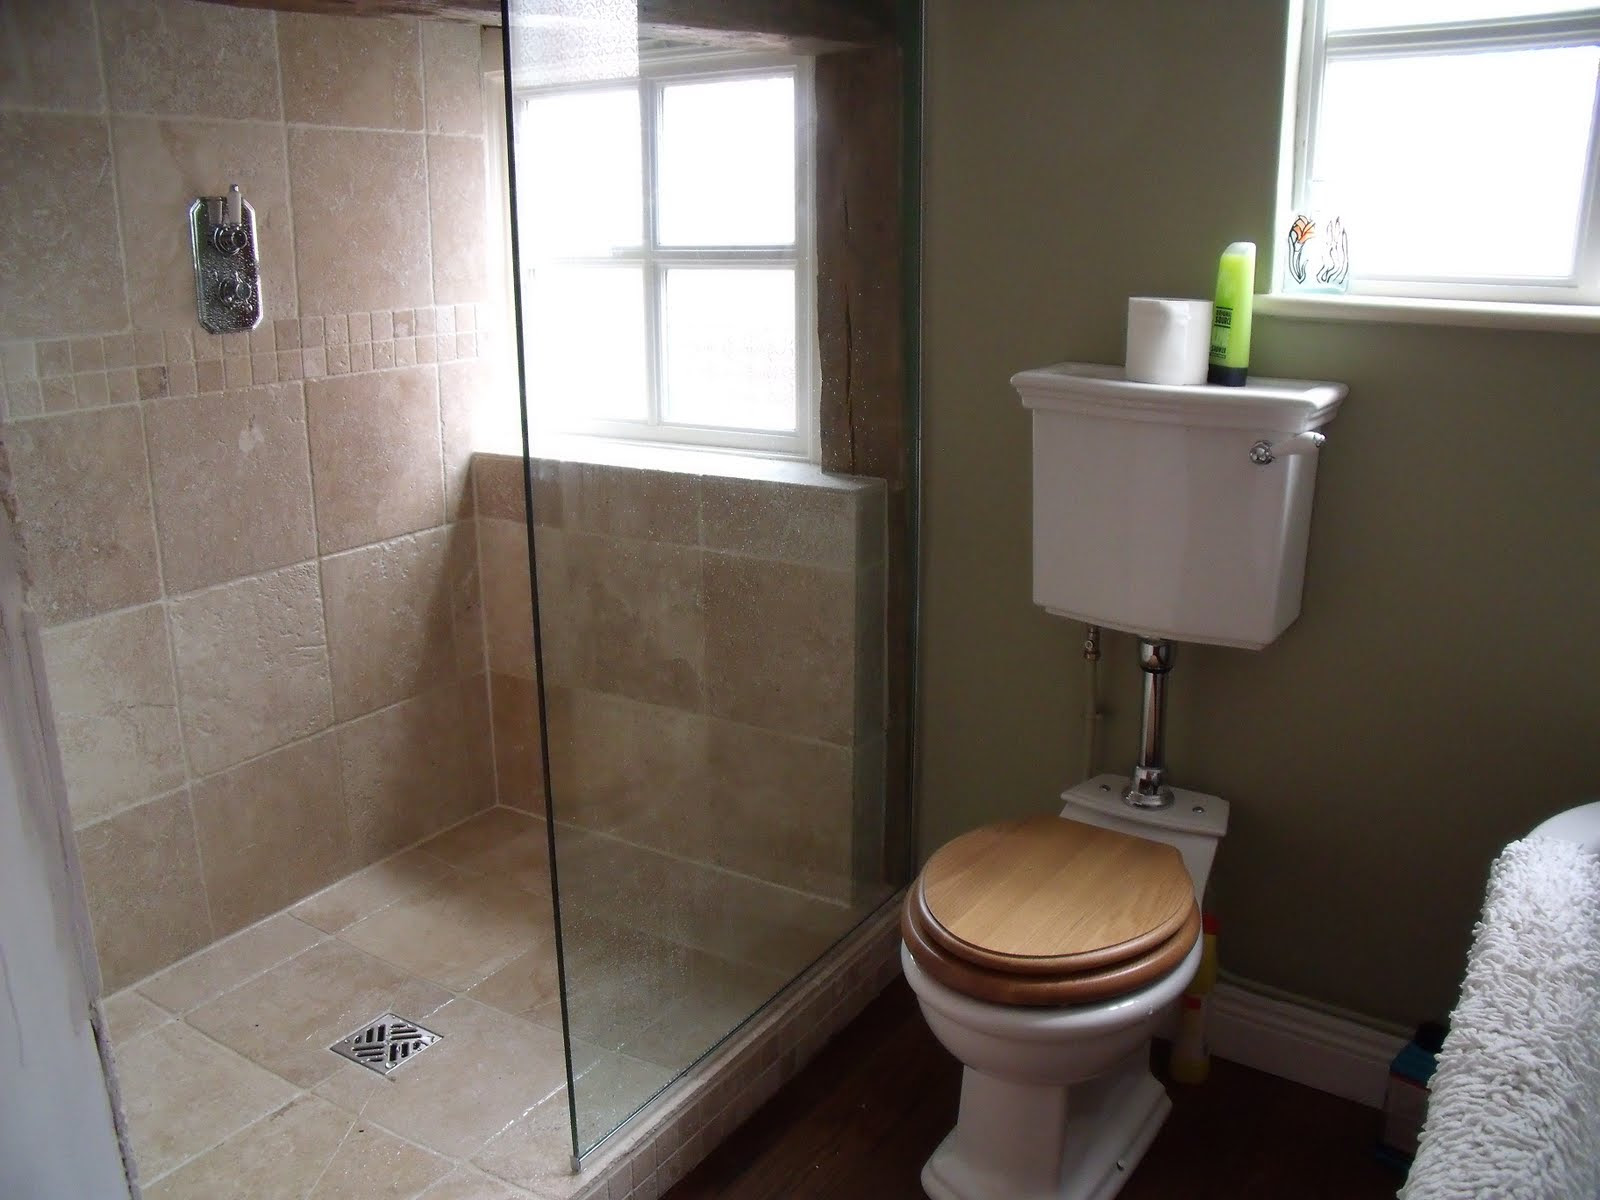 Walk In Shower Designs For Small Space | Joy Studio Design ...